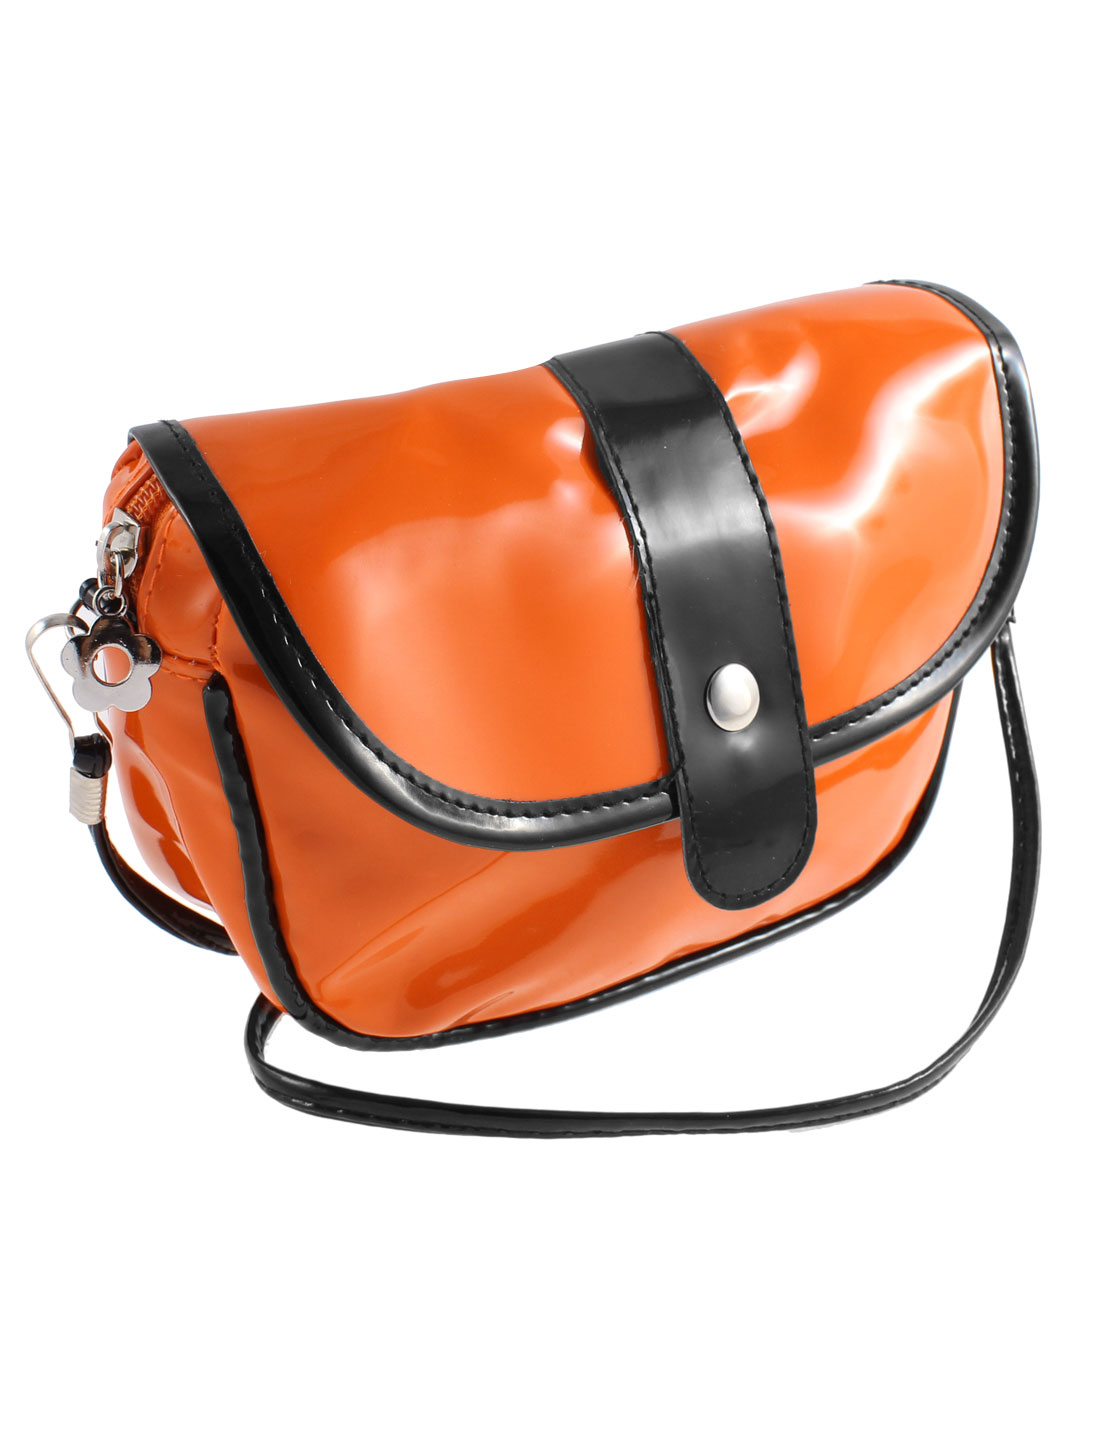 Press Button Dual Cards Pockets Patent Leather Shoulder Bag Satchel Orange